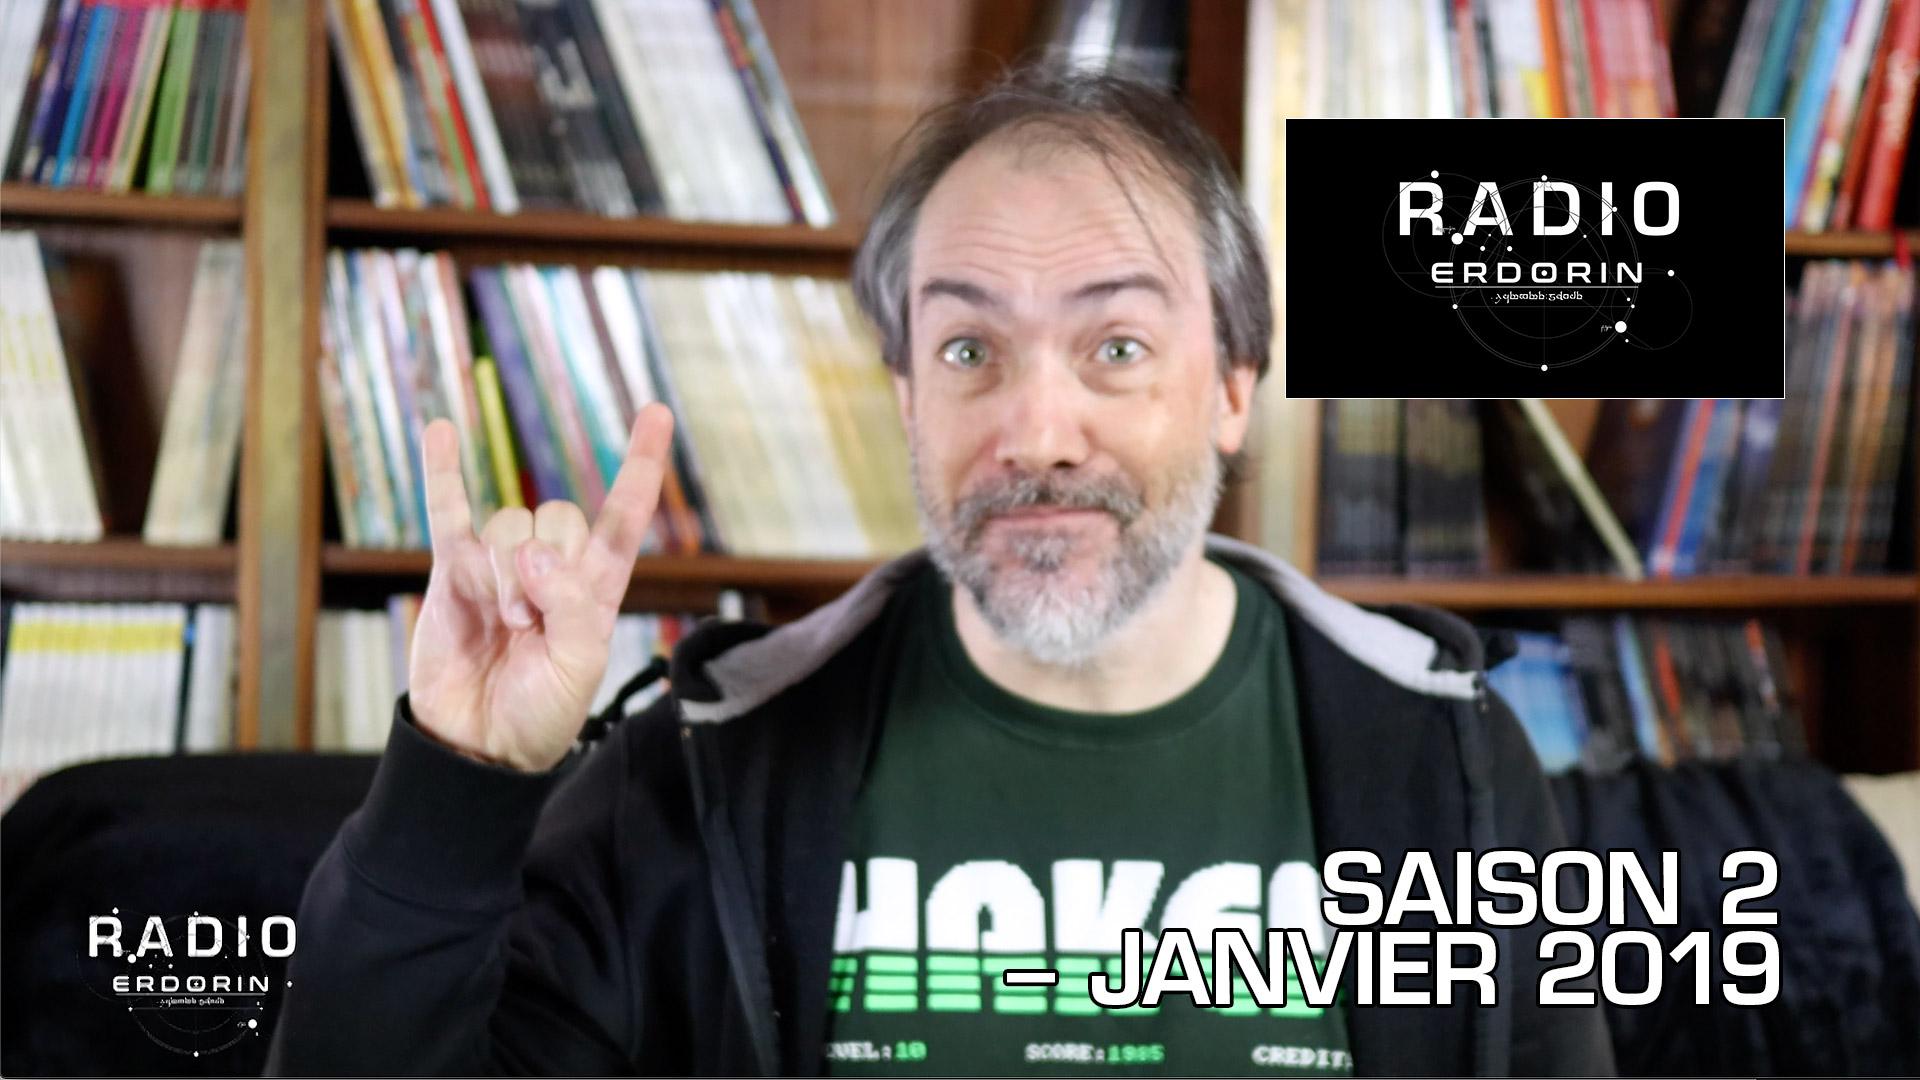 Radio-Erdorin S2E1 – Janvier 2019